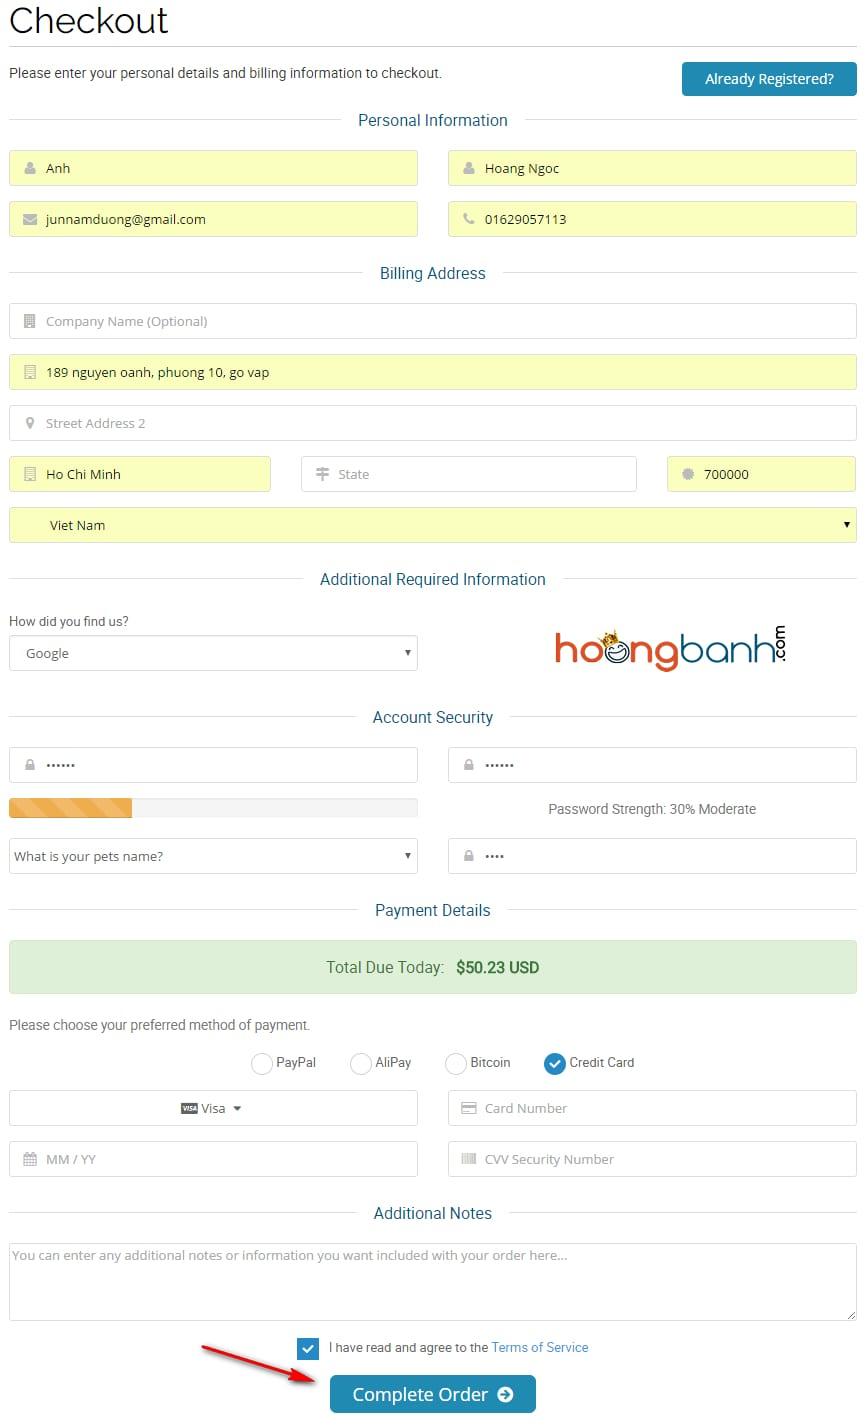 huong dan mua hosting hawkhost Đánh giá hawkhost Đánh giá Hawkhost dịch vụ Hosting đáng dùng huong dan mua hosting hawkhost1